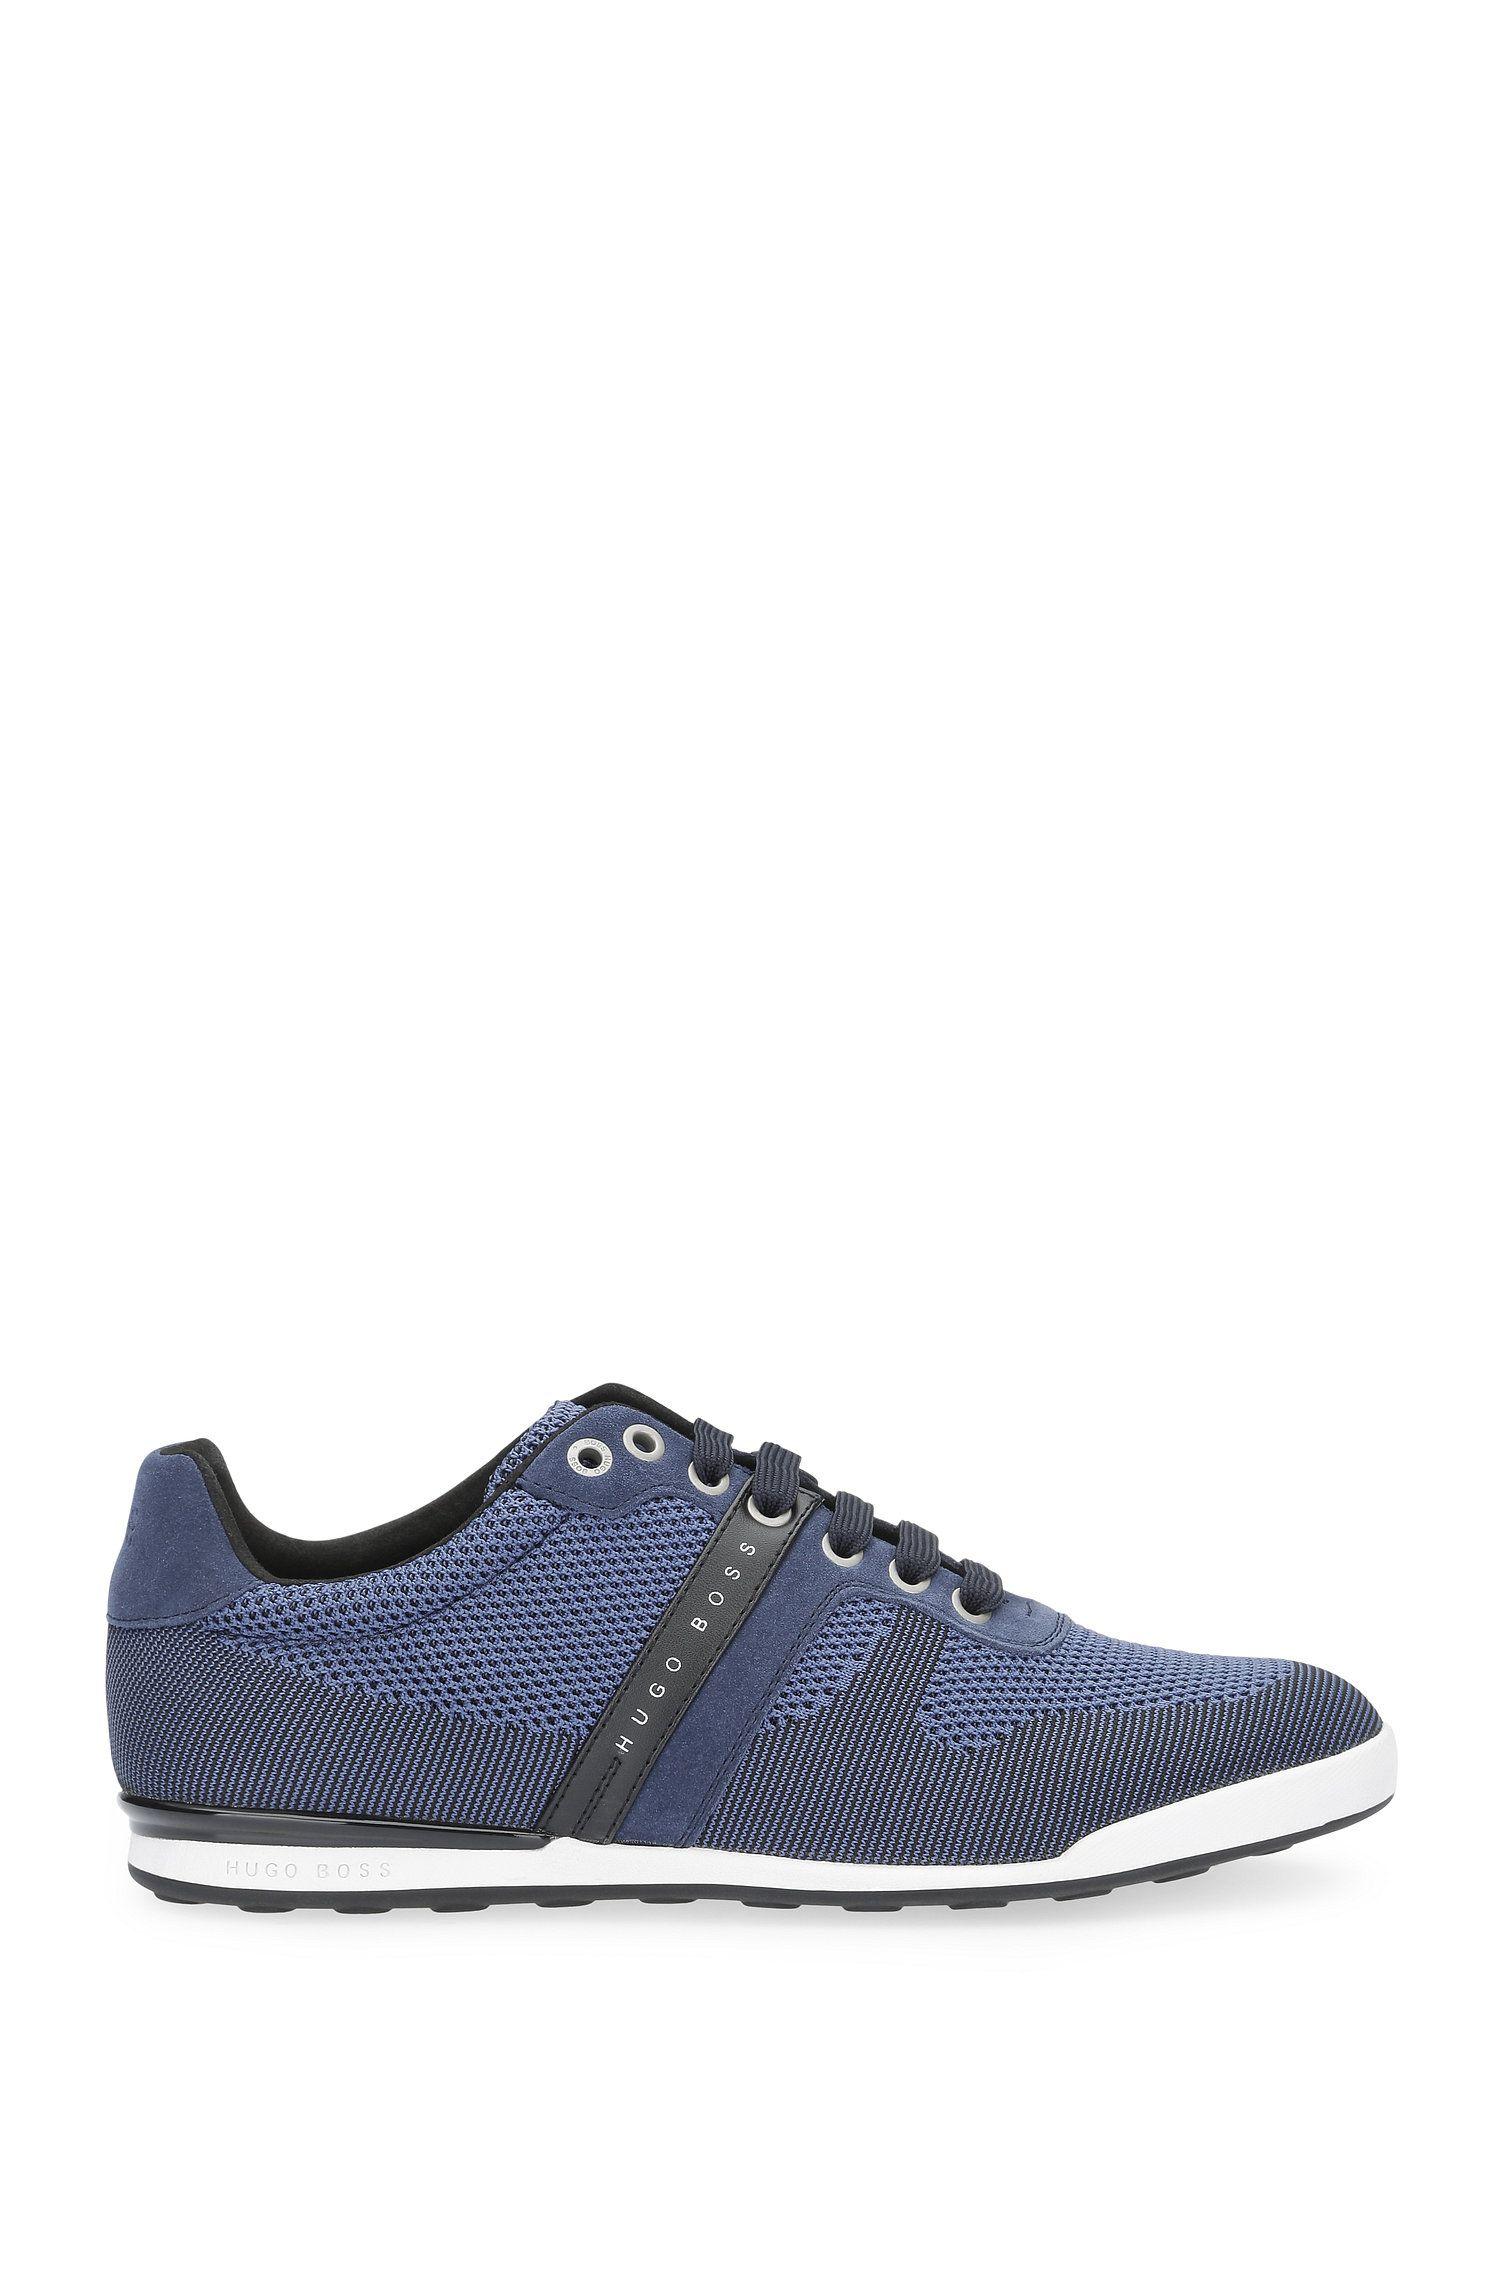 Low Top Sneakers aus Leder und Textil in Strick-Optik: ´Arkansas_Lowp_syjq`